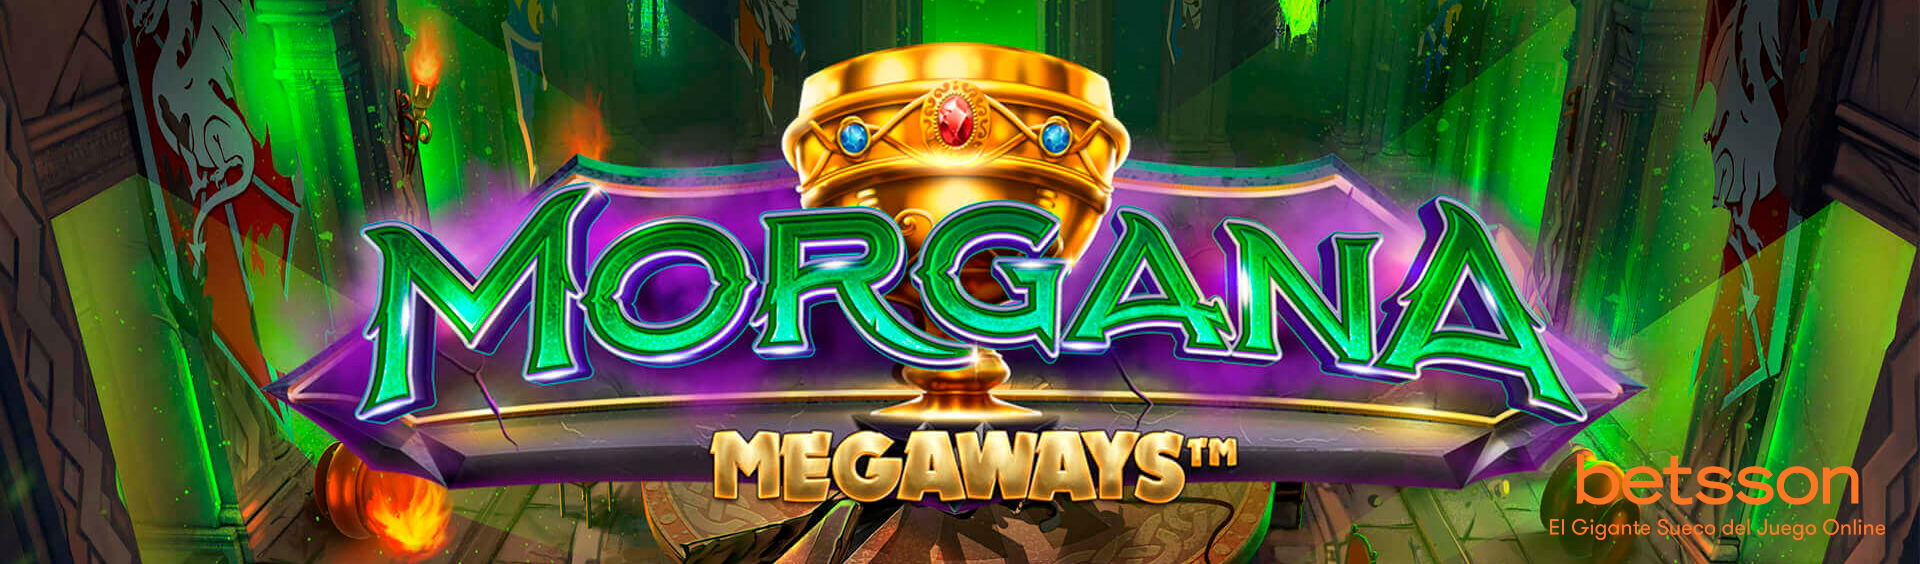 Slot Review: Morgana Megaways